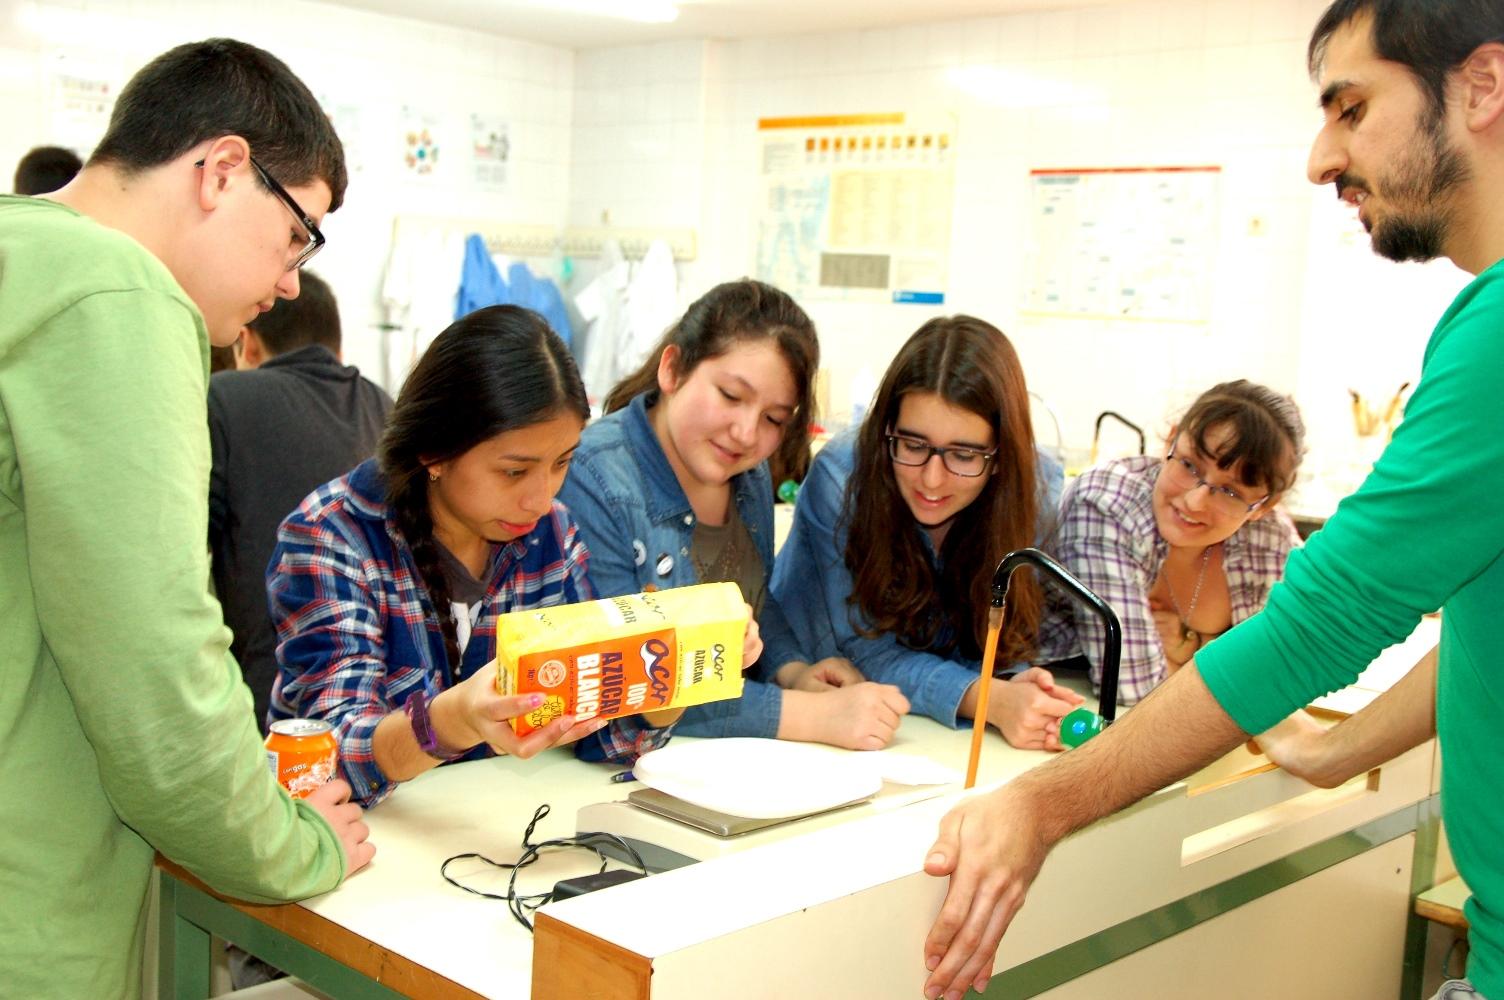 programa_STEM_curs2015_2016_ins_coromines